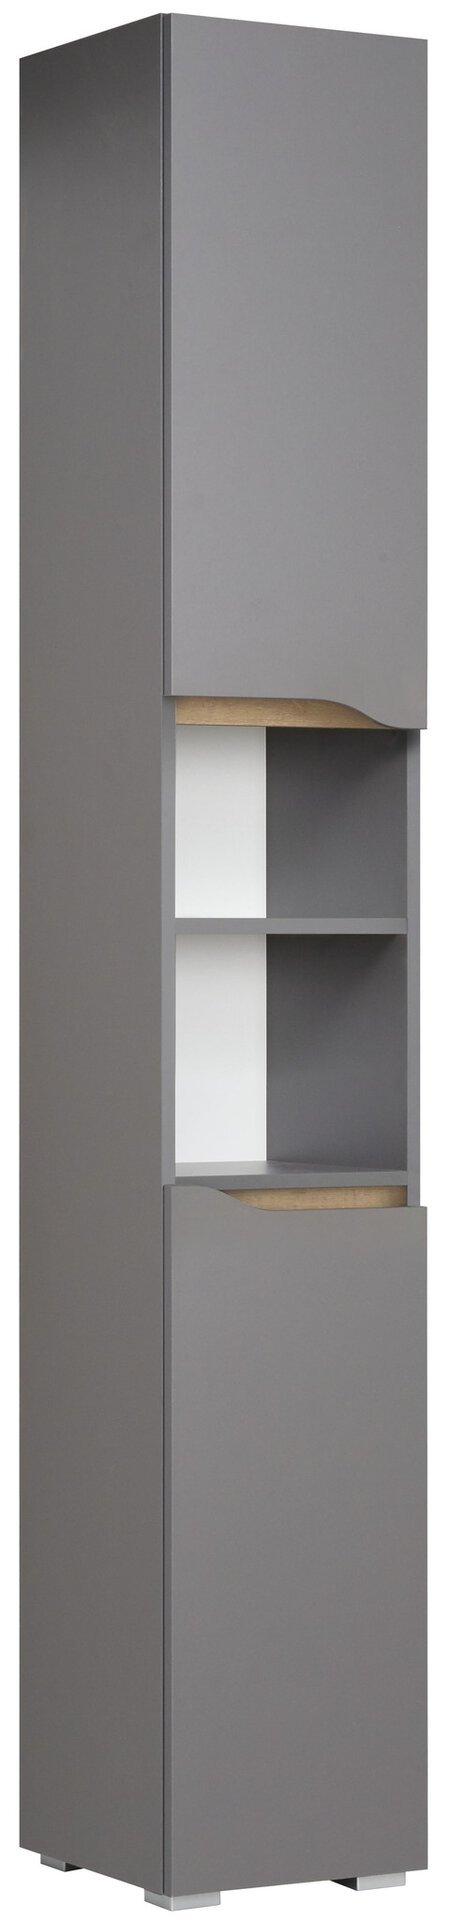 Hochschrank Capri PELIPAL Holzwerkstoff grau